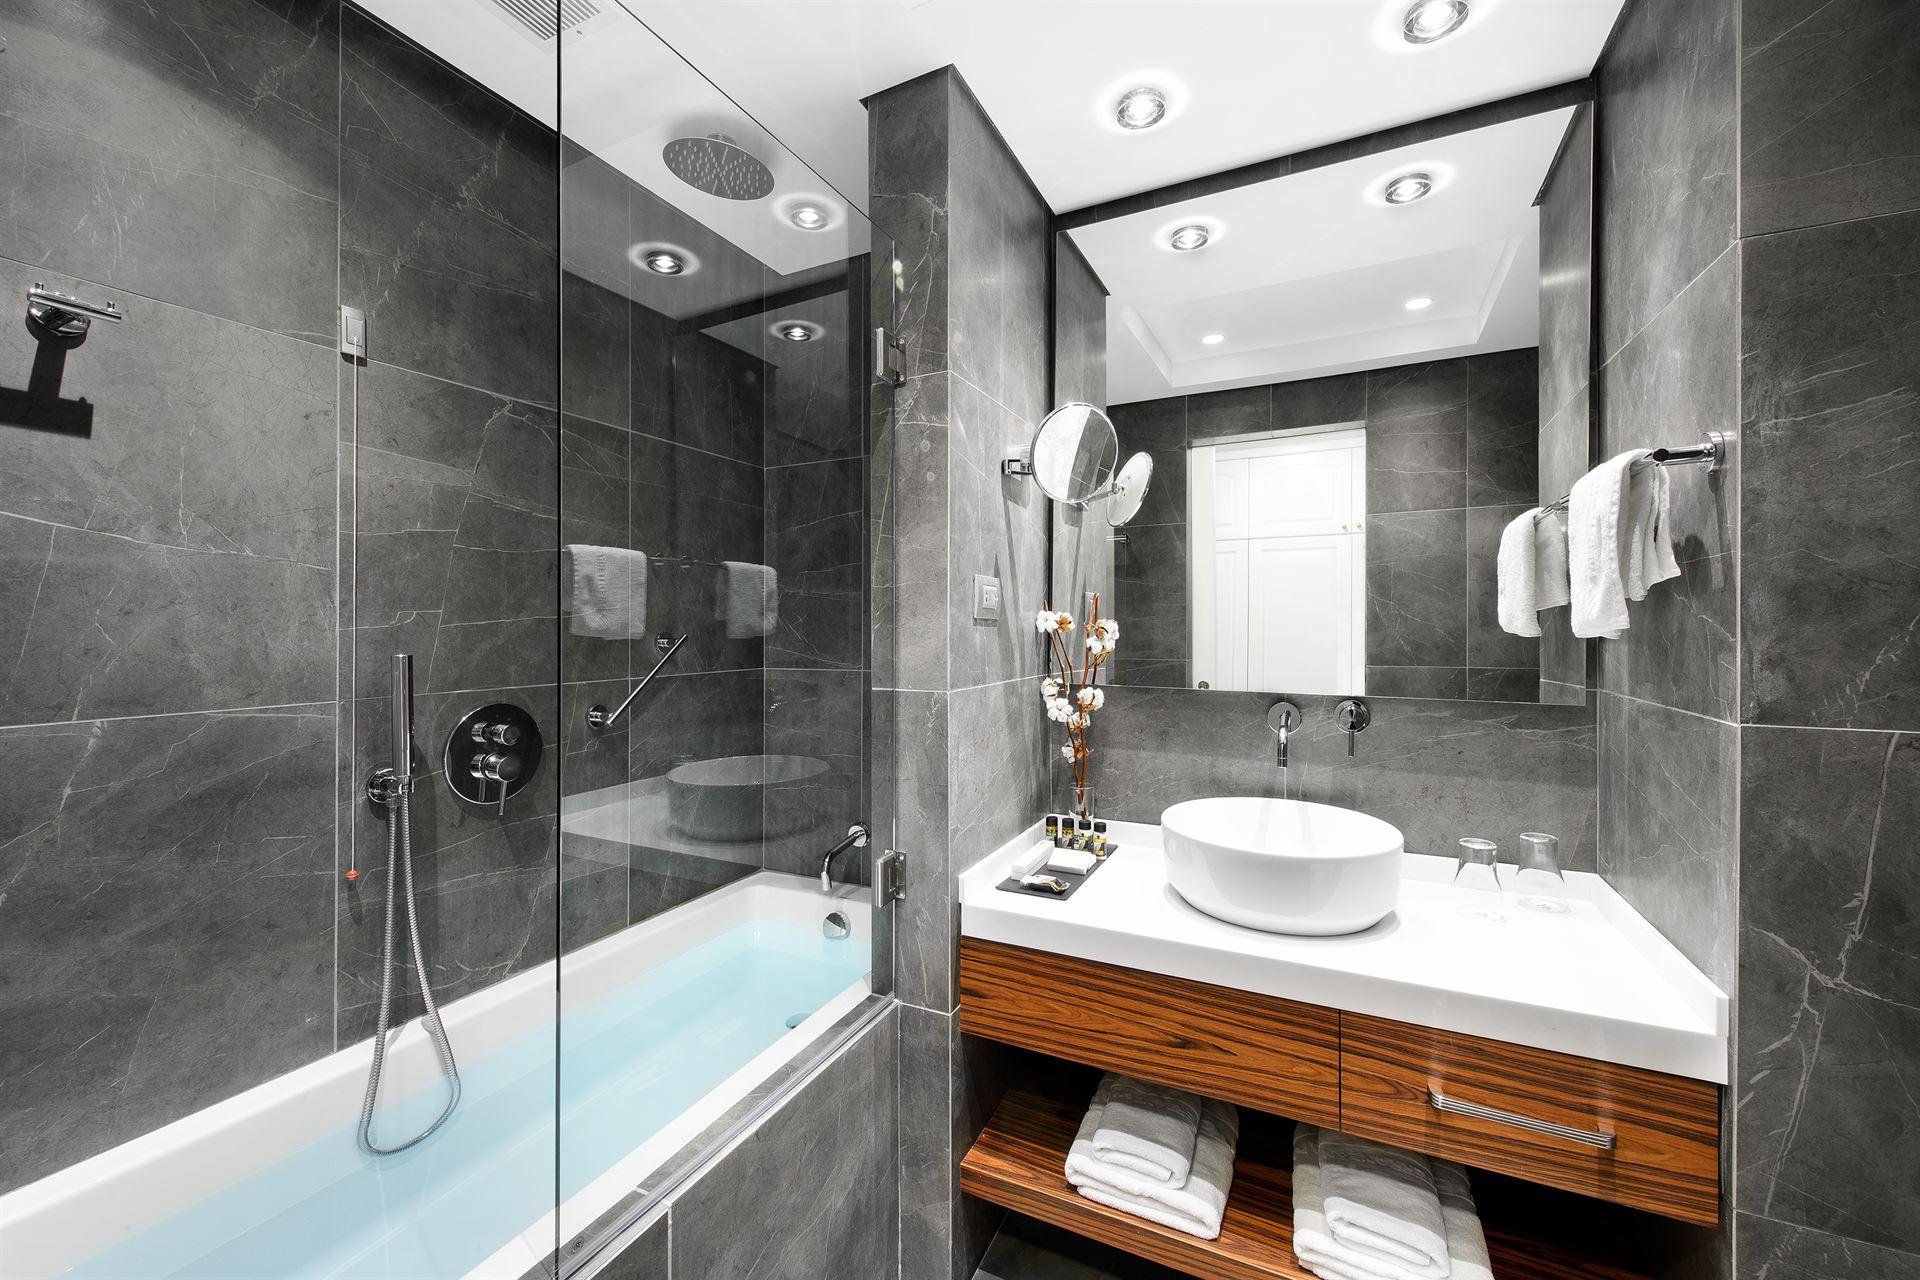 Mediterranean Palace Hotel: Premium Bathroom